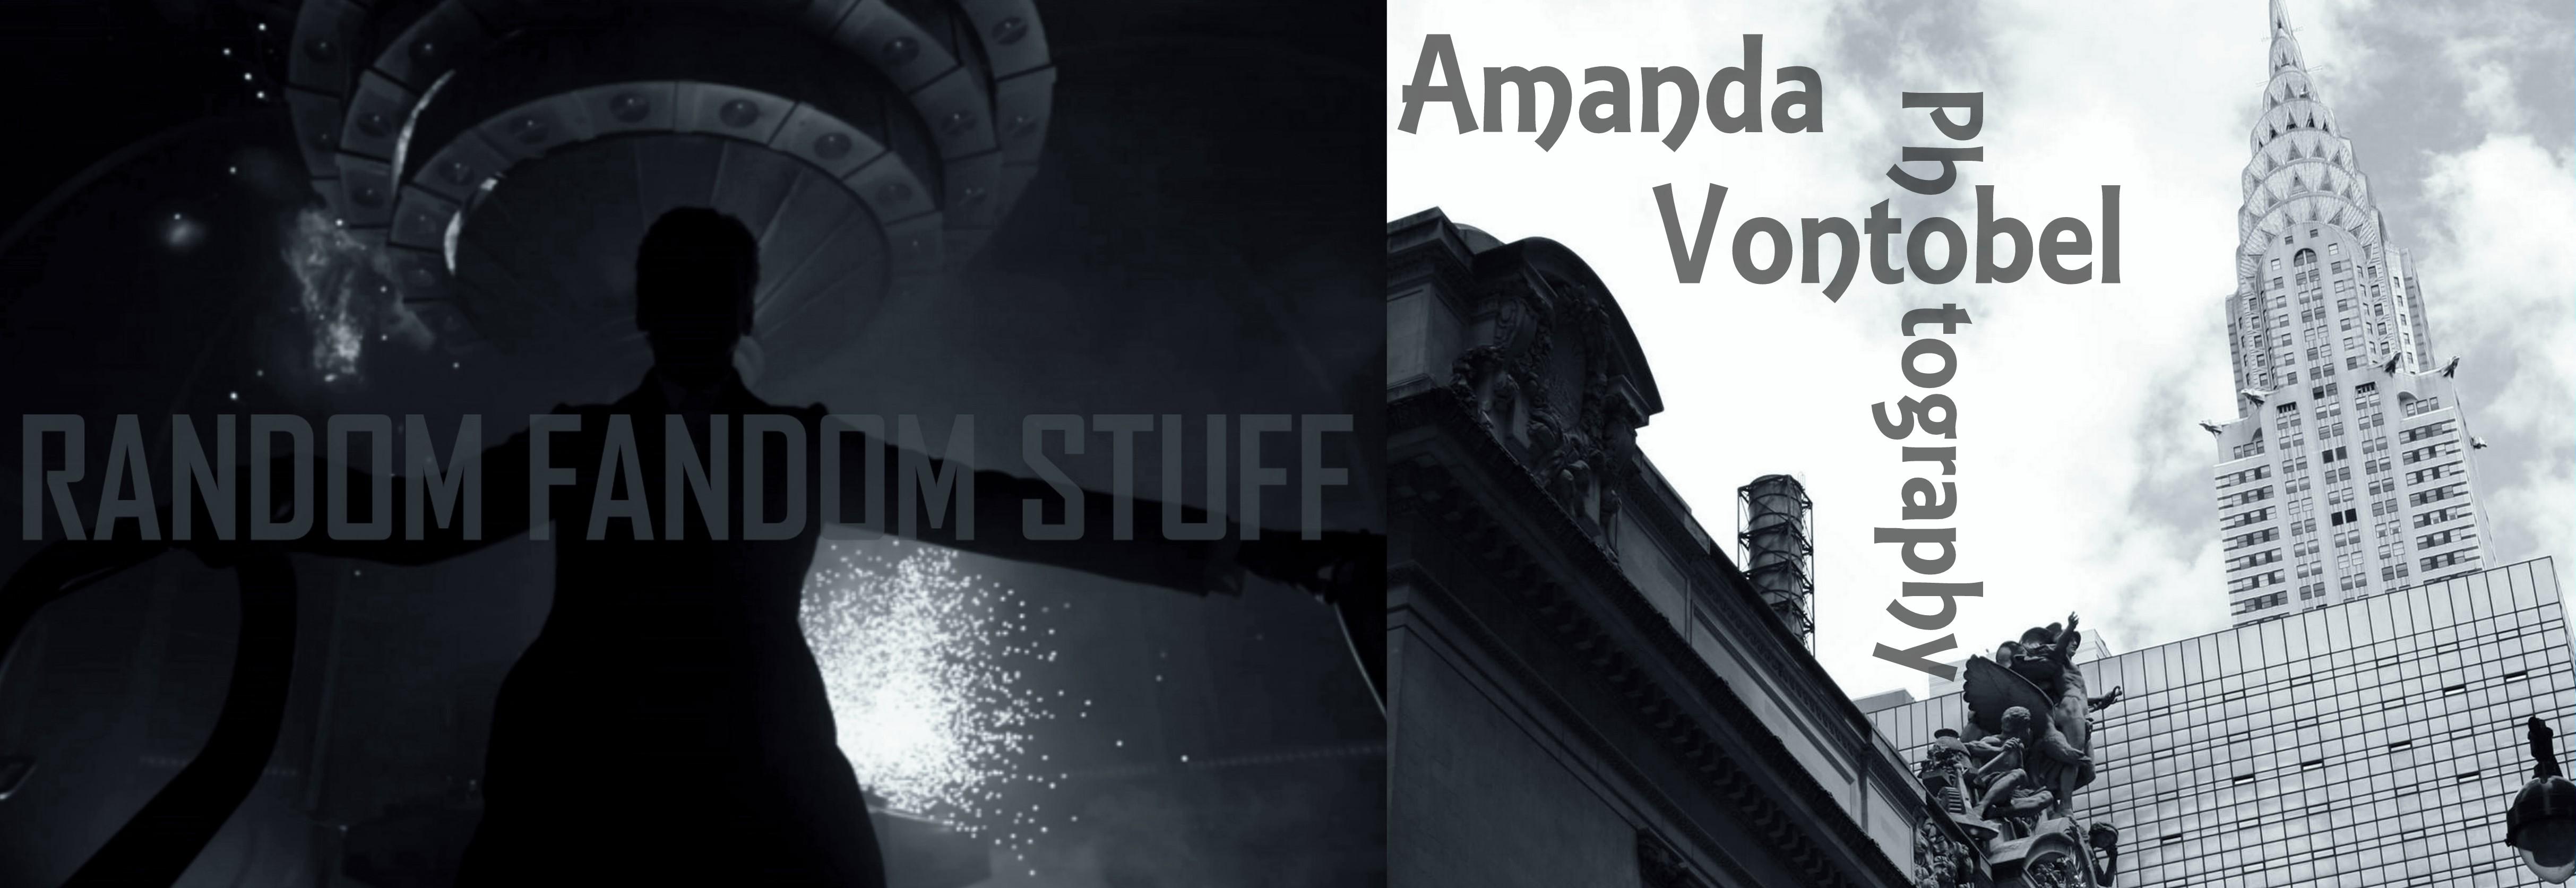 AVimages & Random Fandom Stuff